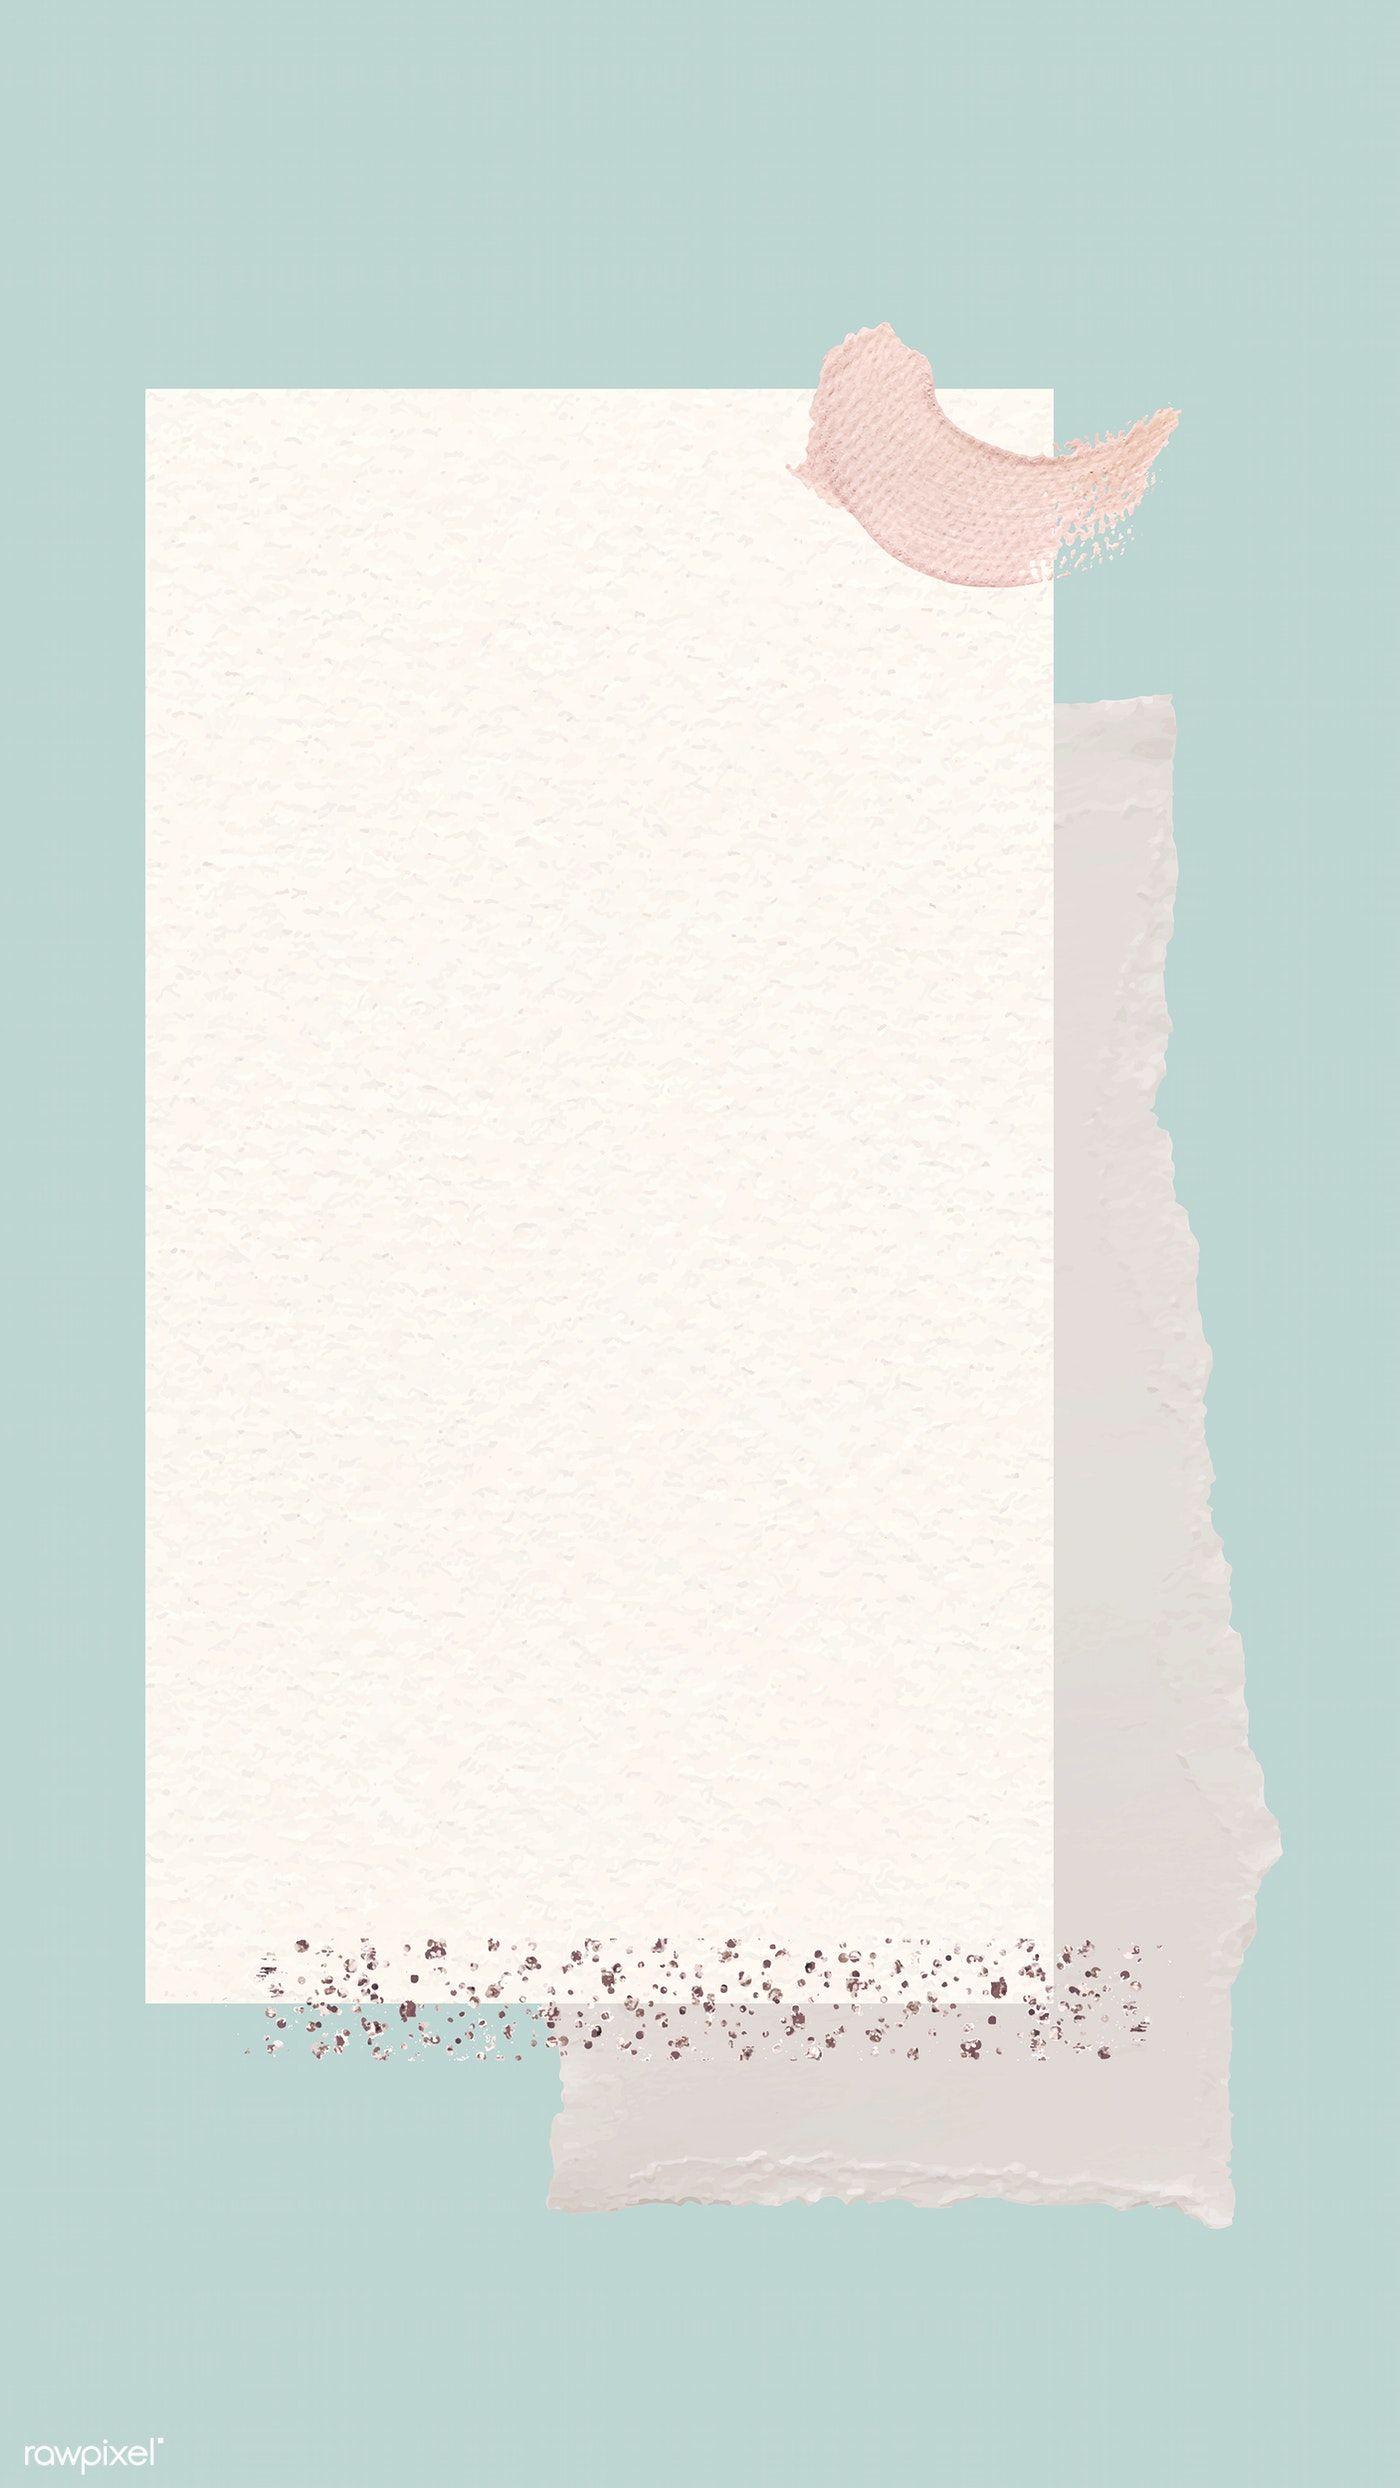 Download Premium Vector Of Blank Beige Notepaper Template Vector 1216050 In 2020 Photo Collage Template Instagram Wallpaper Note Paper